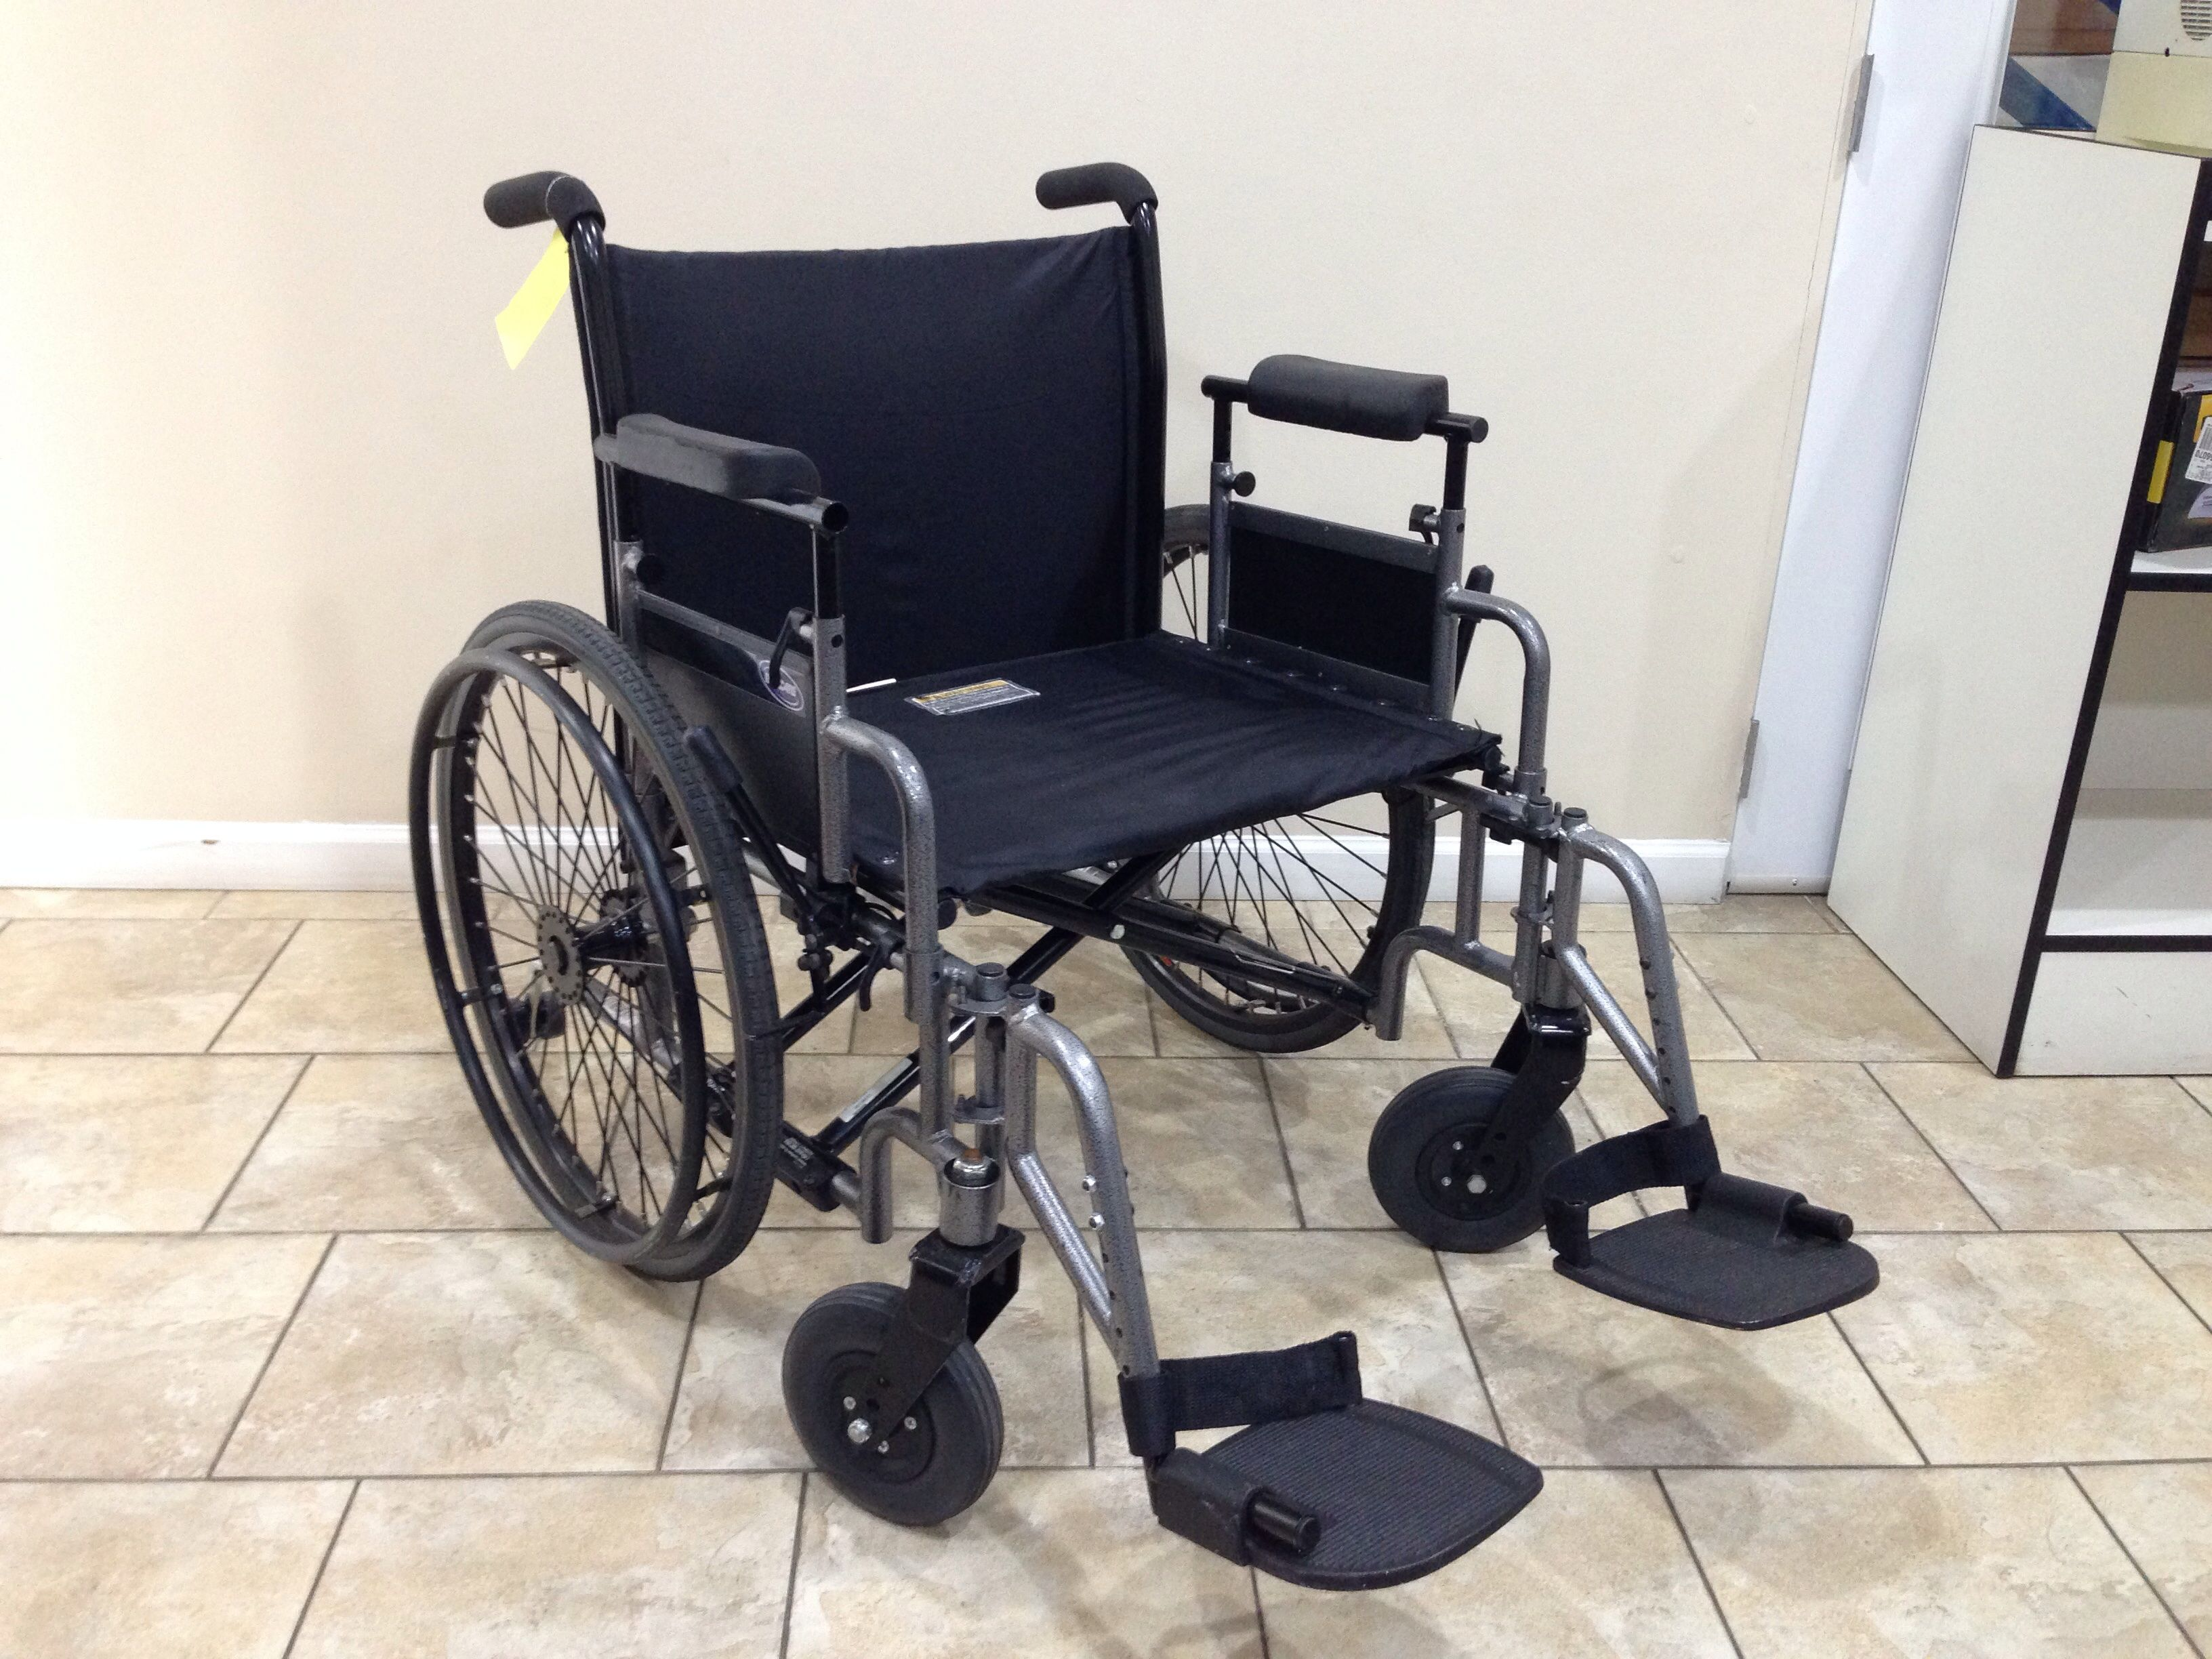 Invacare 9000 topaz heavy duty manual wheelchair used